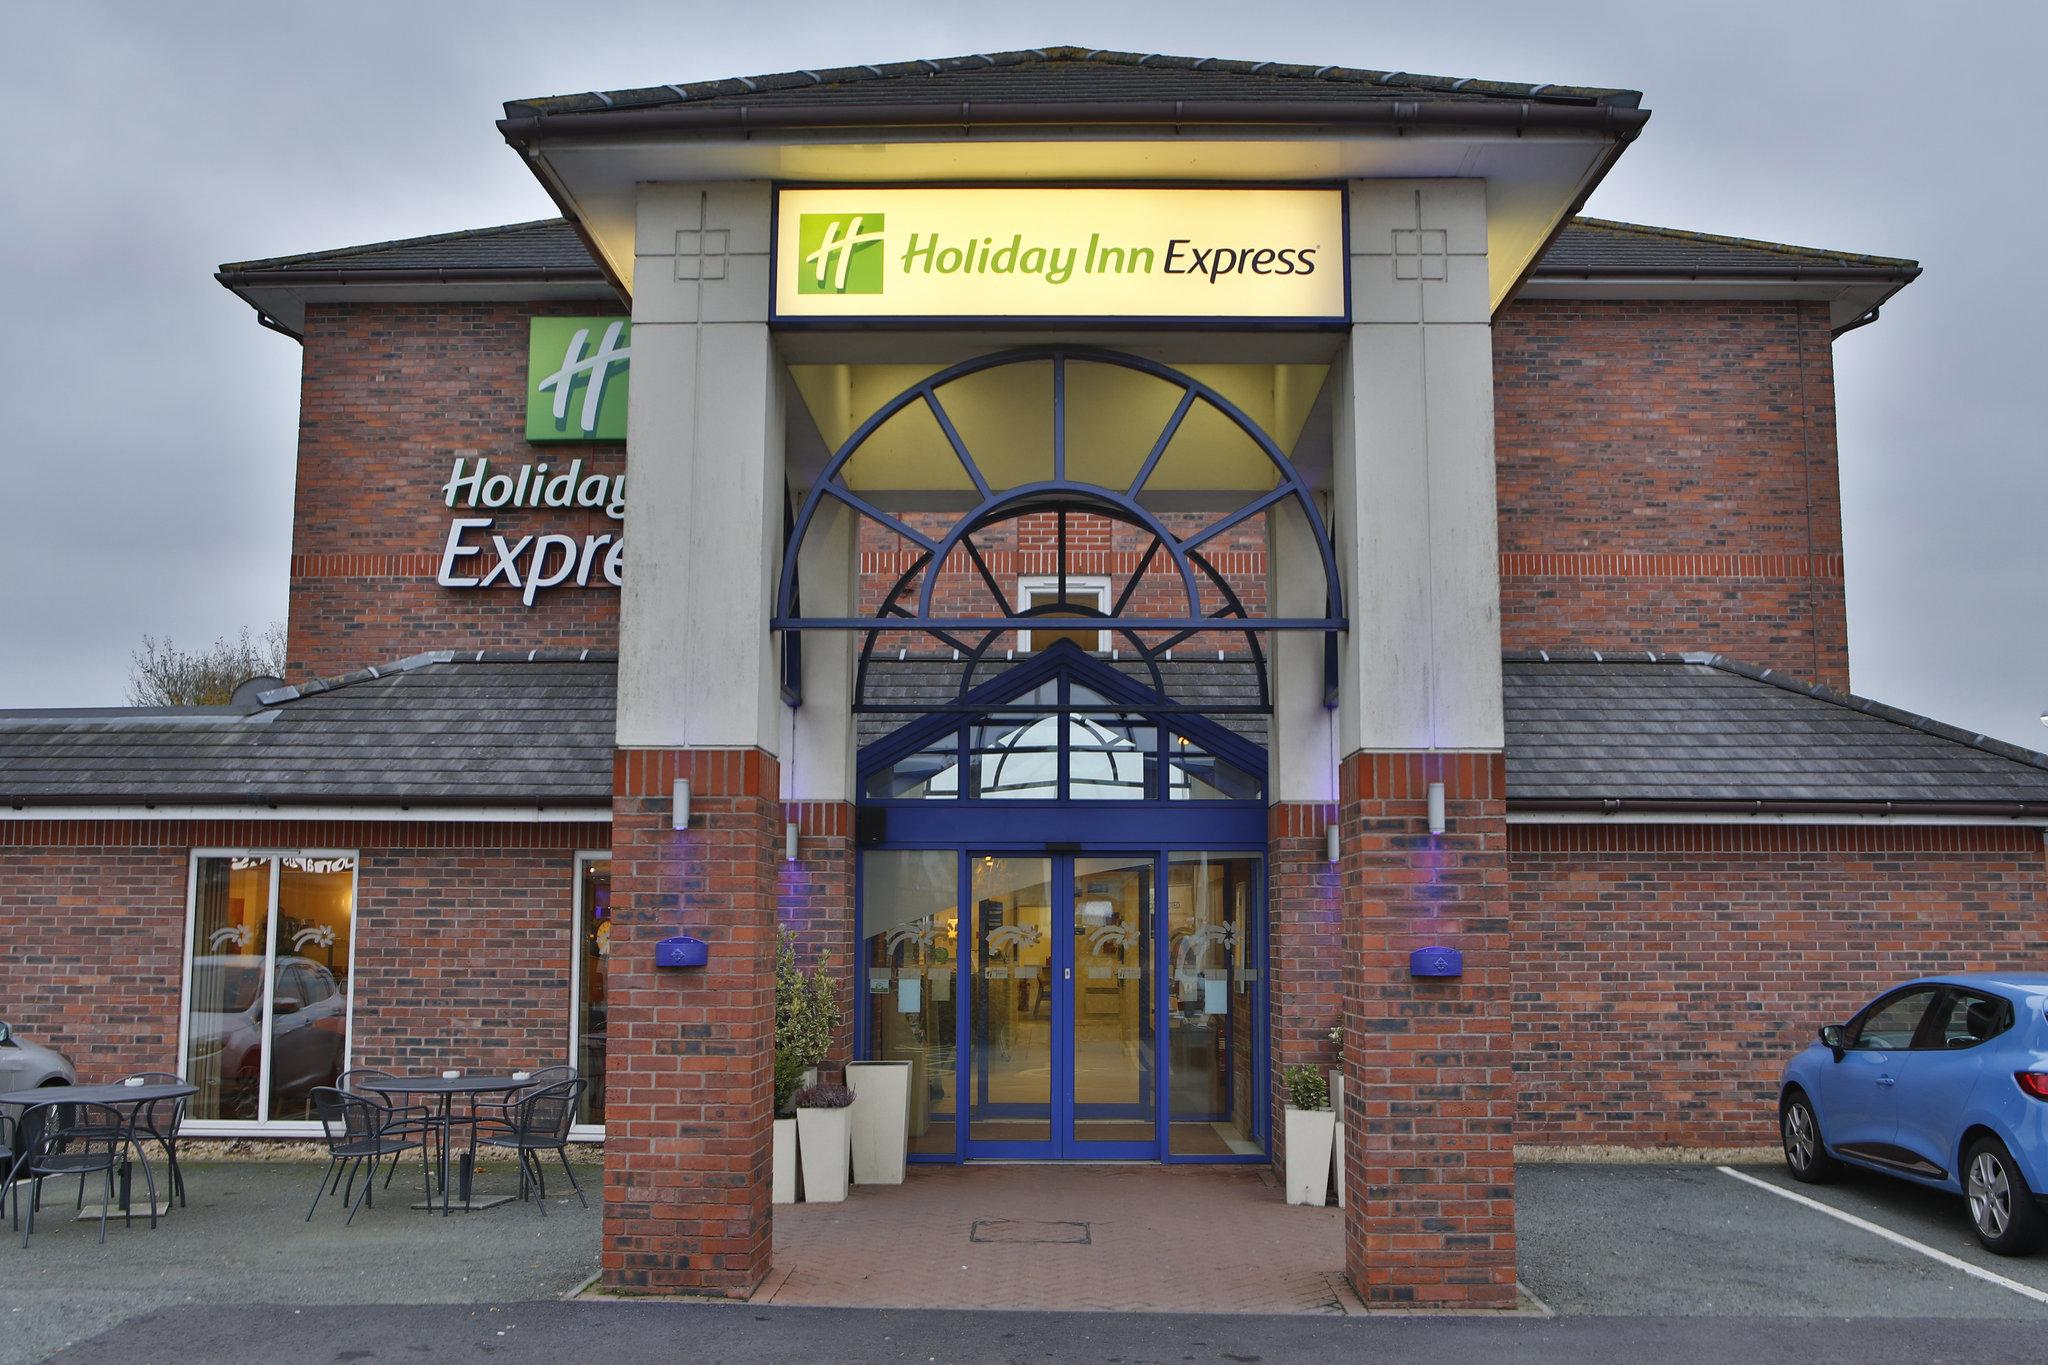 Holiday Inn Express Lichfield Hotel